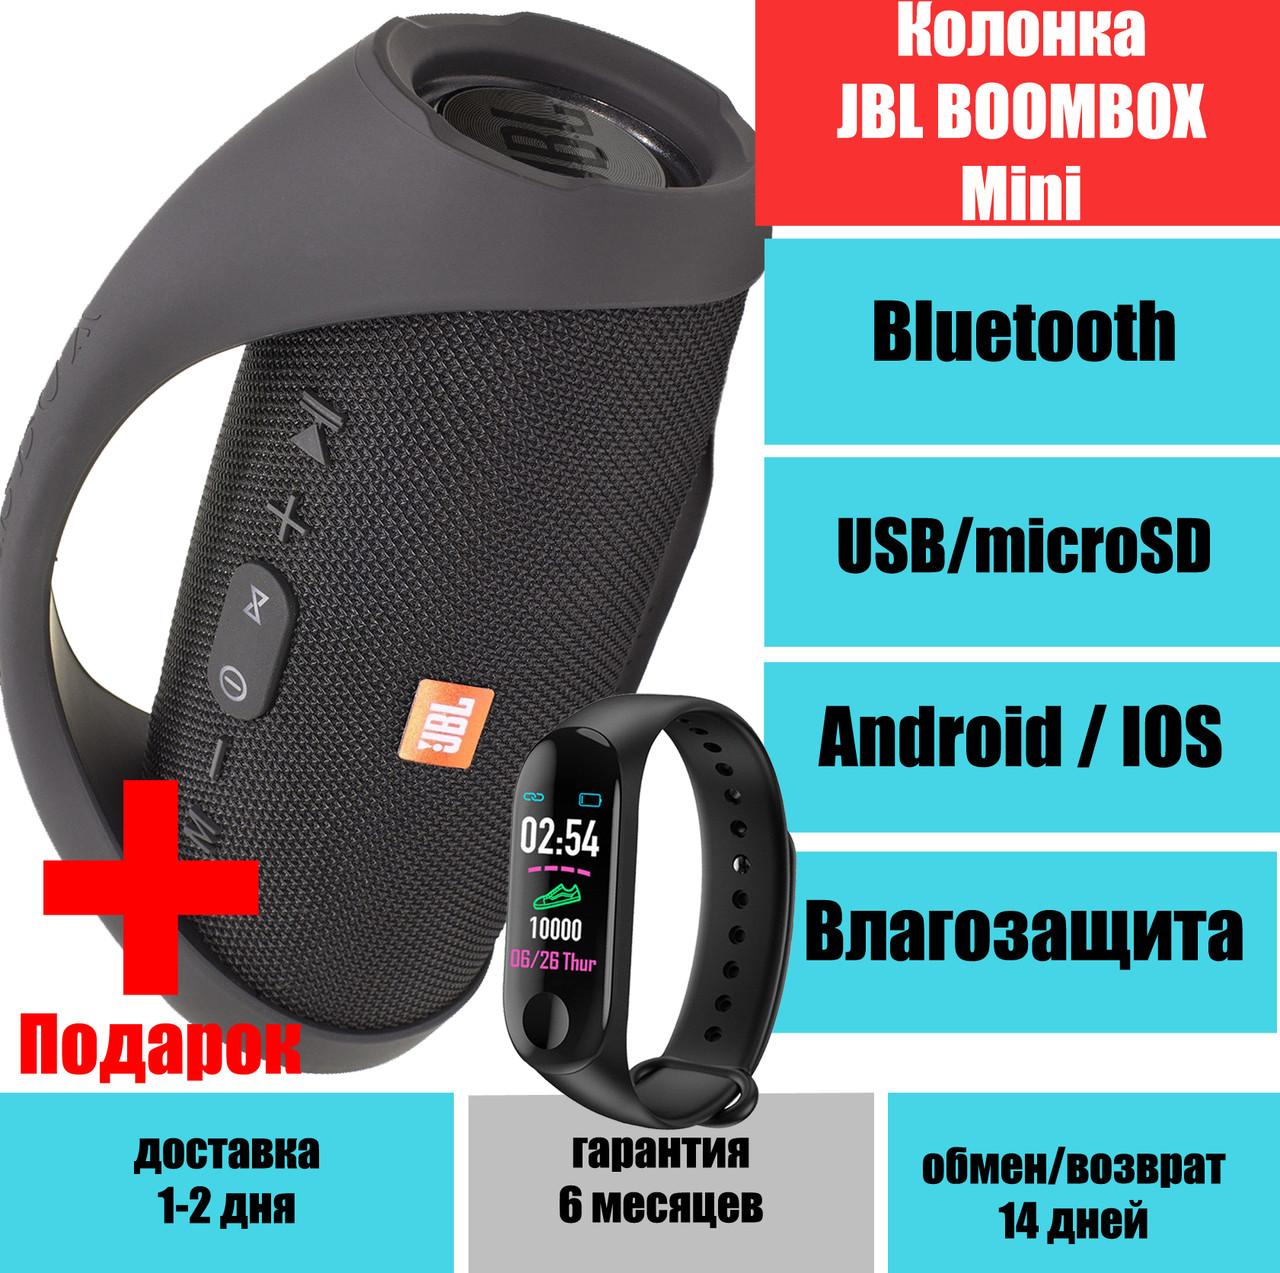 Колонка JBL Boombox MINI Bluetooth FM MP3 AUX USB, PowerBank, 20W QualitiReplica + подарок Фитнес Браслет M3